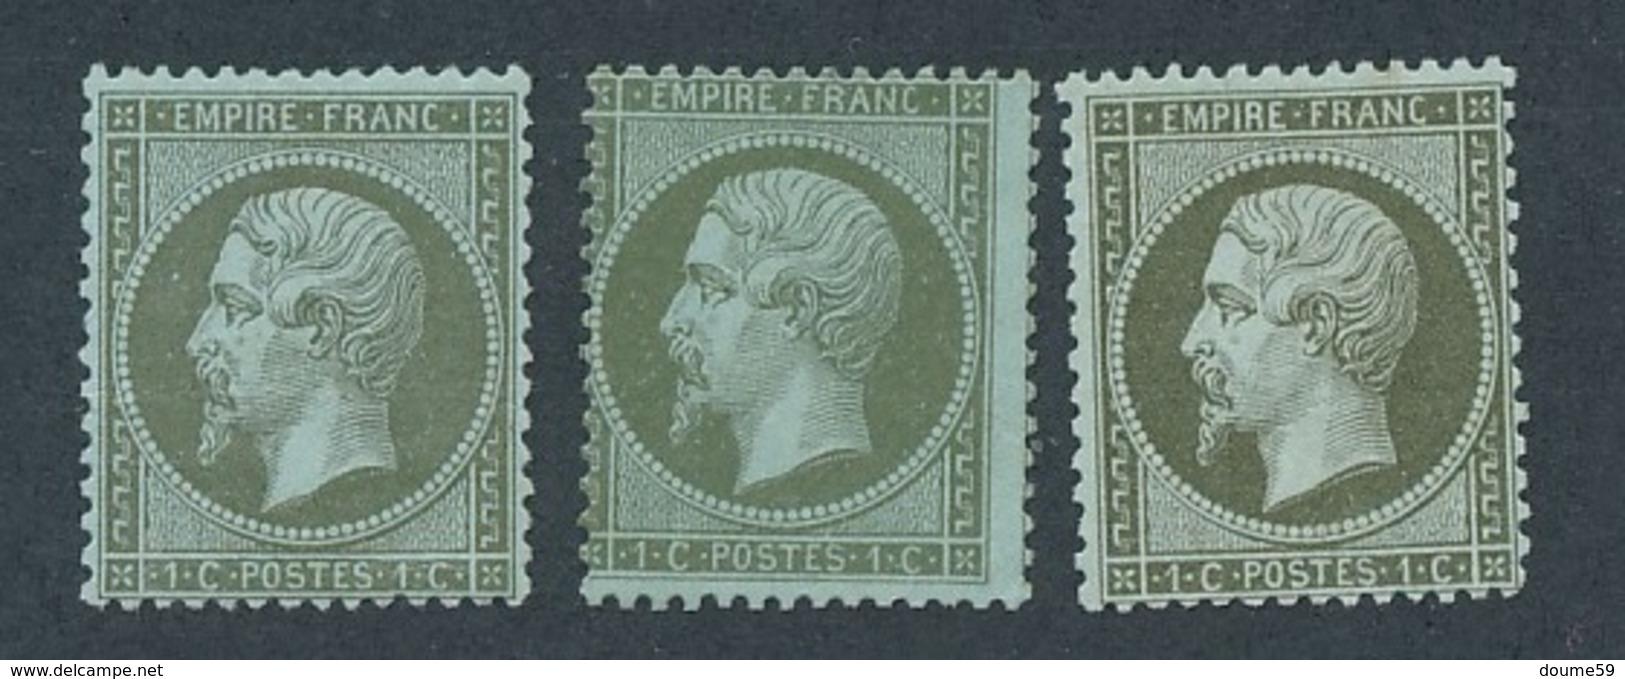 CZ-91: FRANCE :lot Avec N°19 NSG (3 Teintes) - 1862 Napoleone III